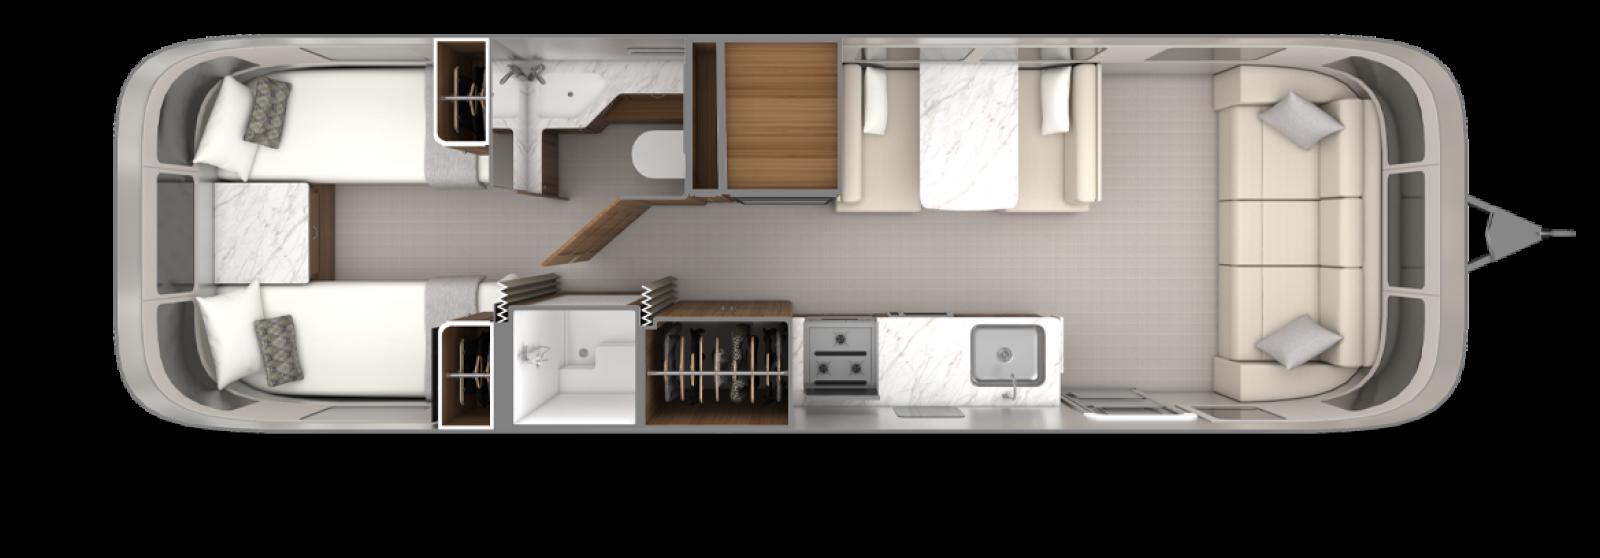 2022_Classic30RB_Floorplan_EstateBrown_Chamomile_Twin